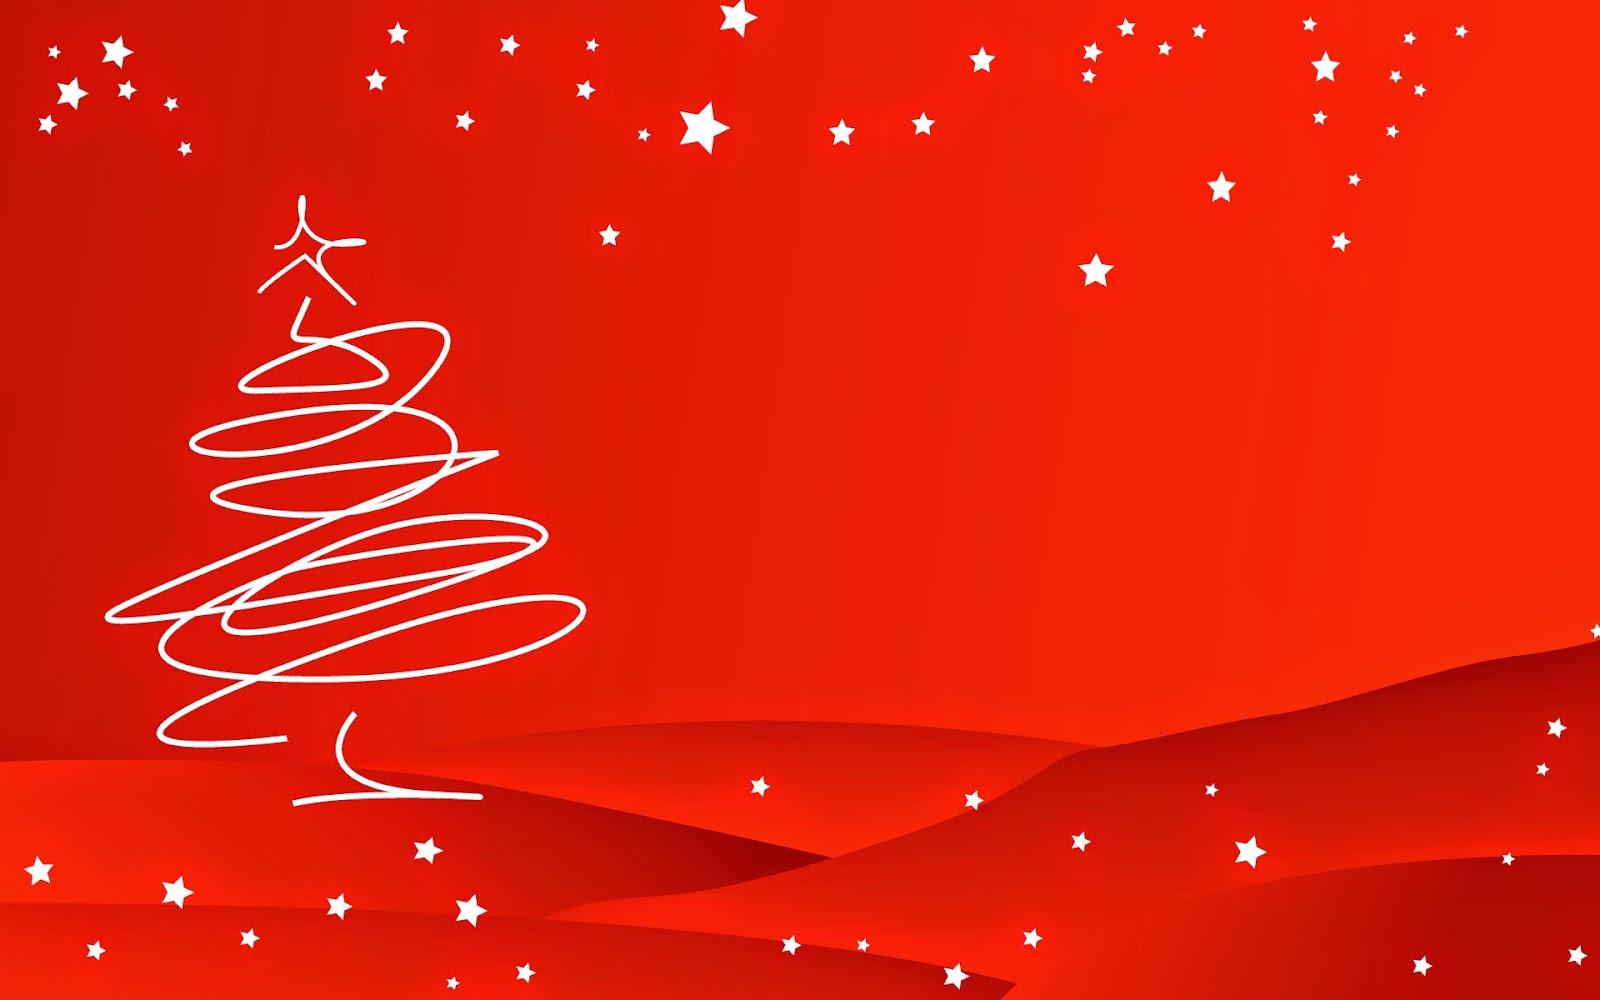 Classic Christmas Motion Background Animation Perfecty: Federico De Robertis : HOY!!! EDICION ESPECIAL USB NAVIDAD